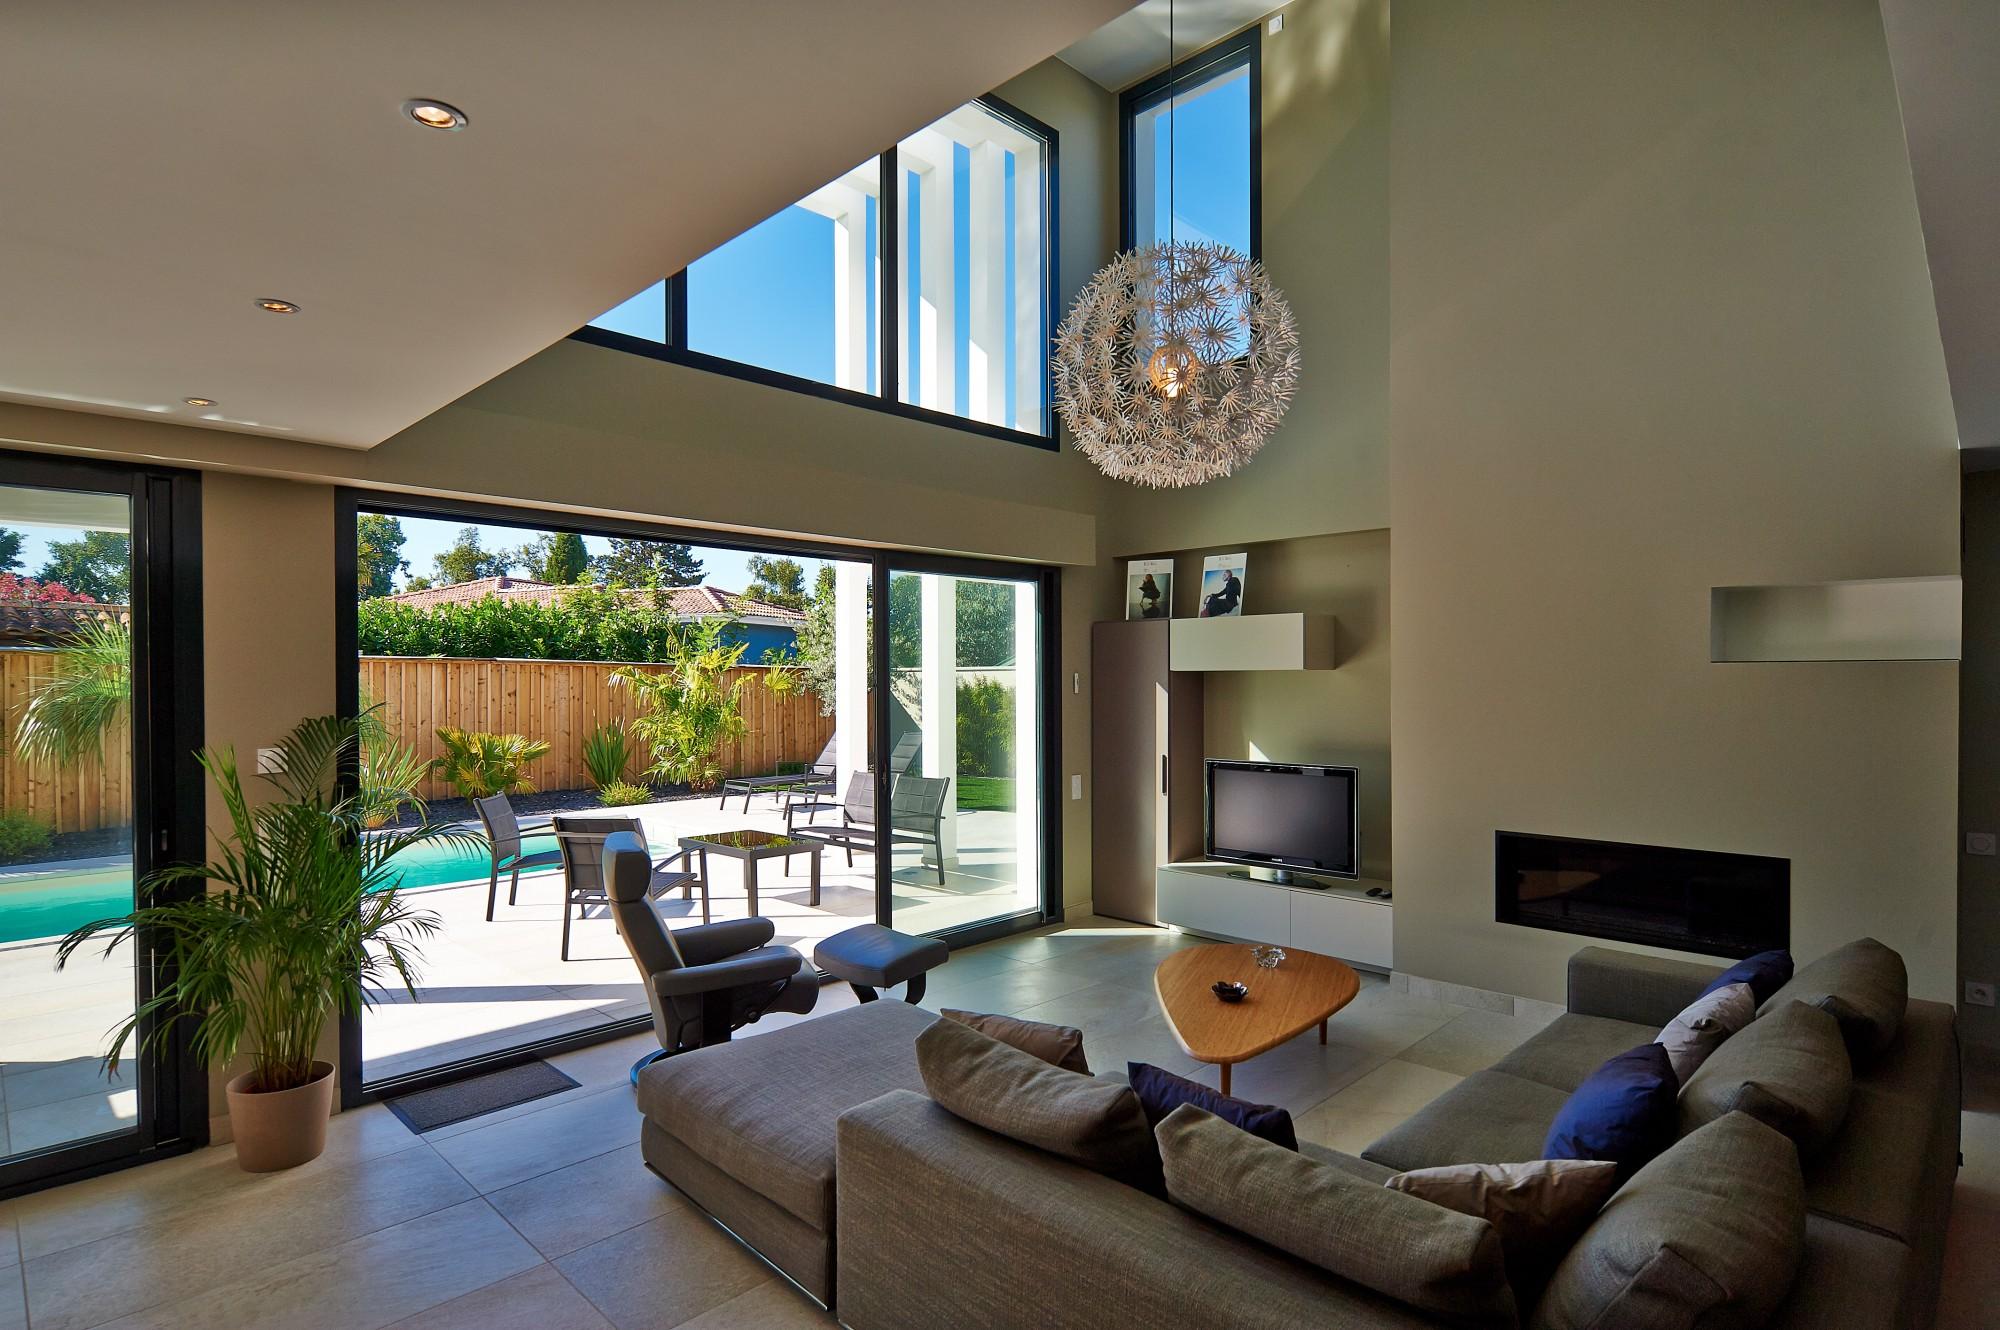 chalet habitable 100m2 maison parallele. Black Bedroom Furniture Sets. Home Design Ideas